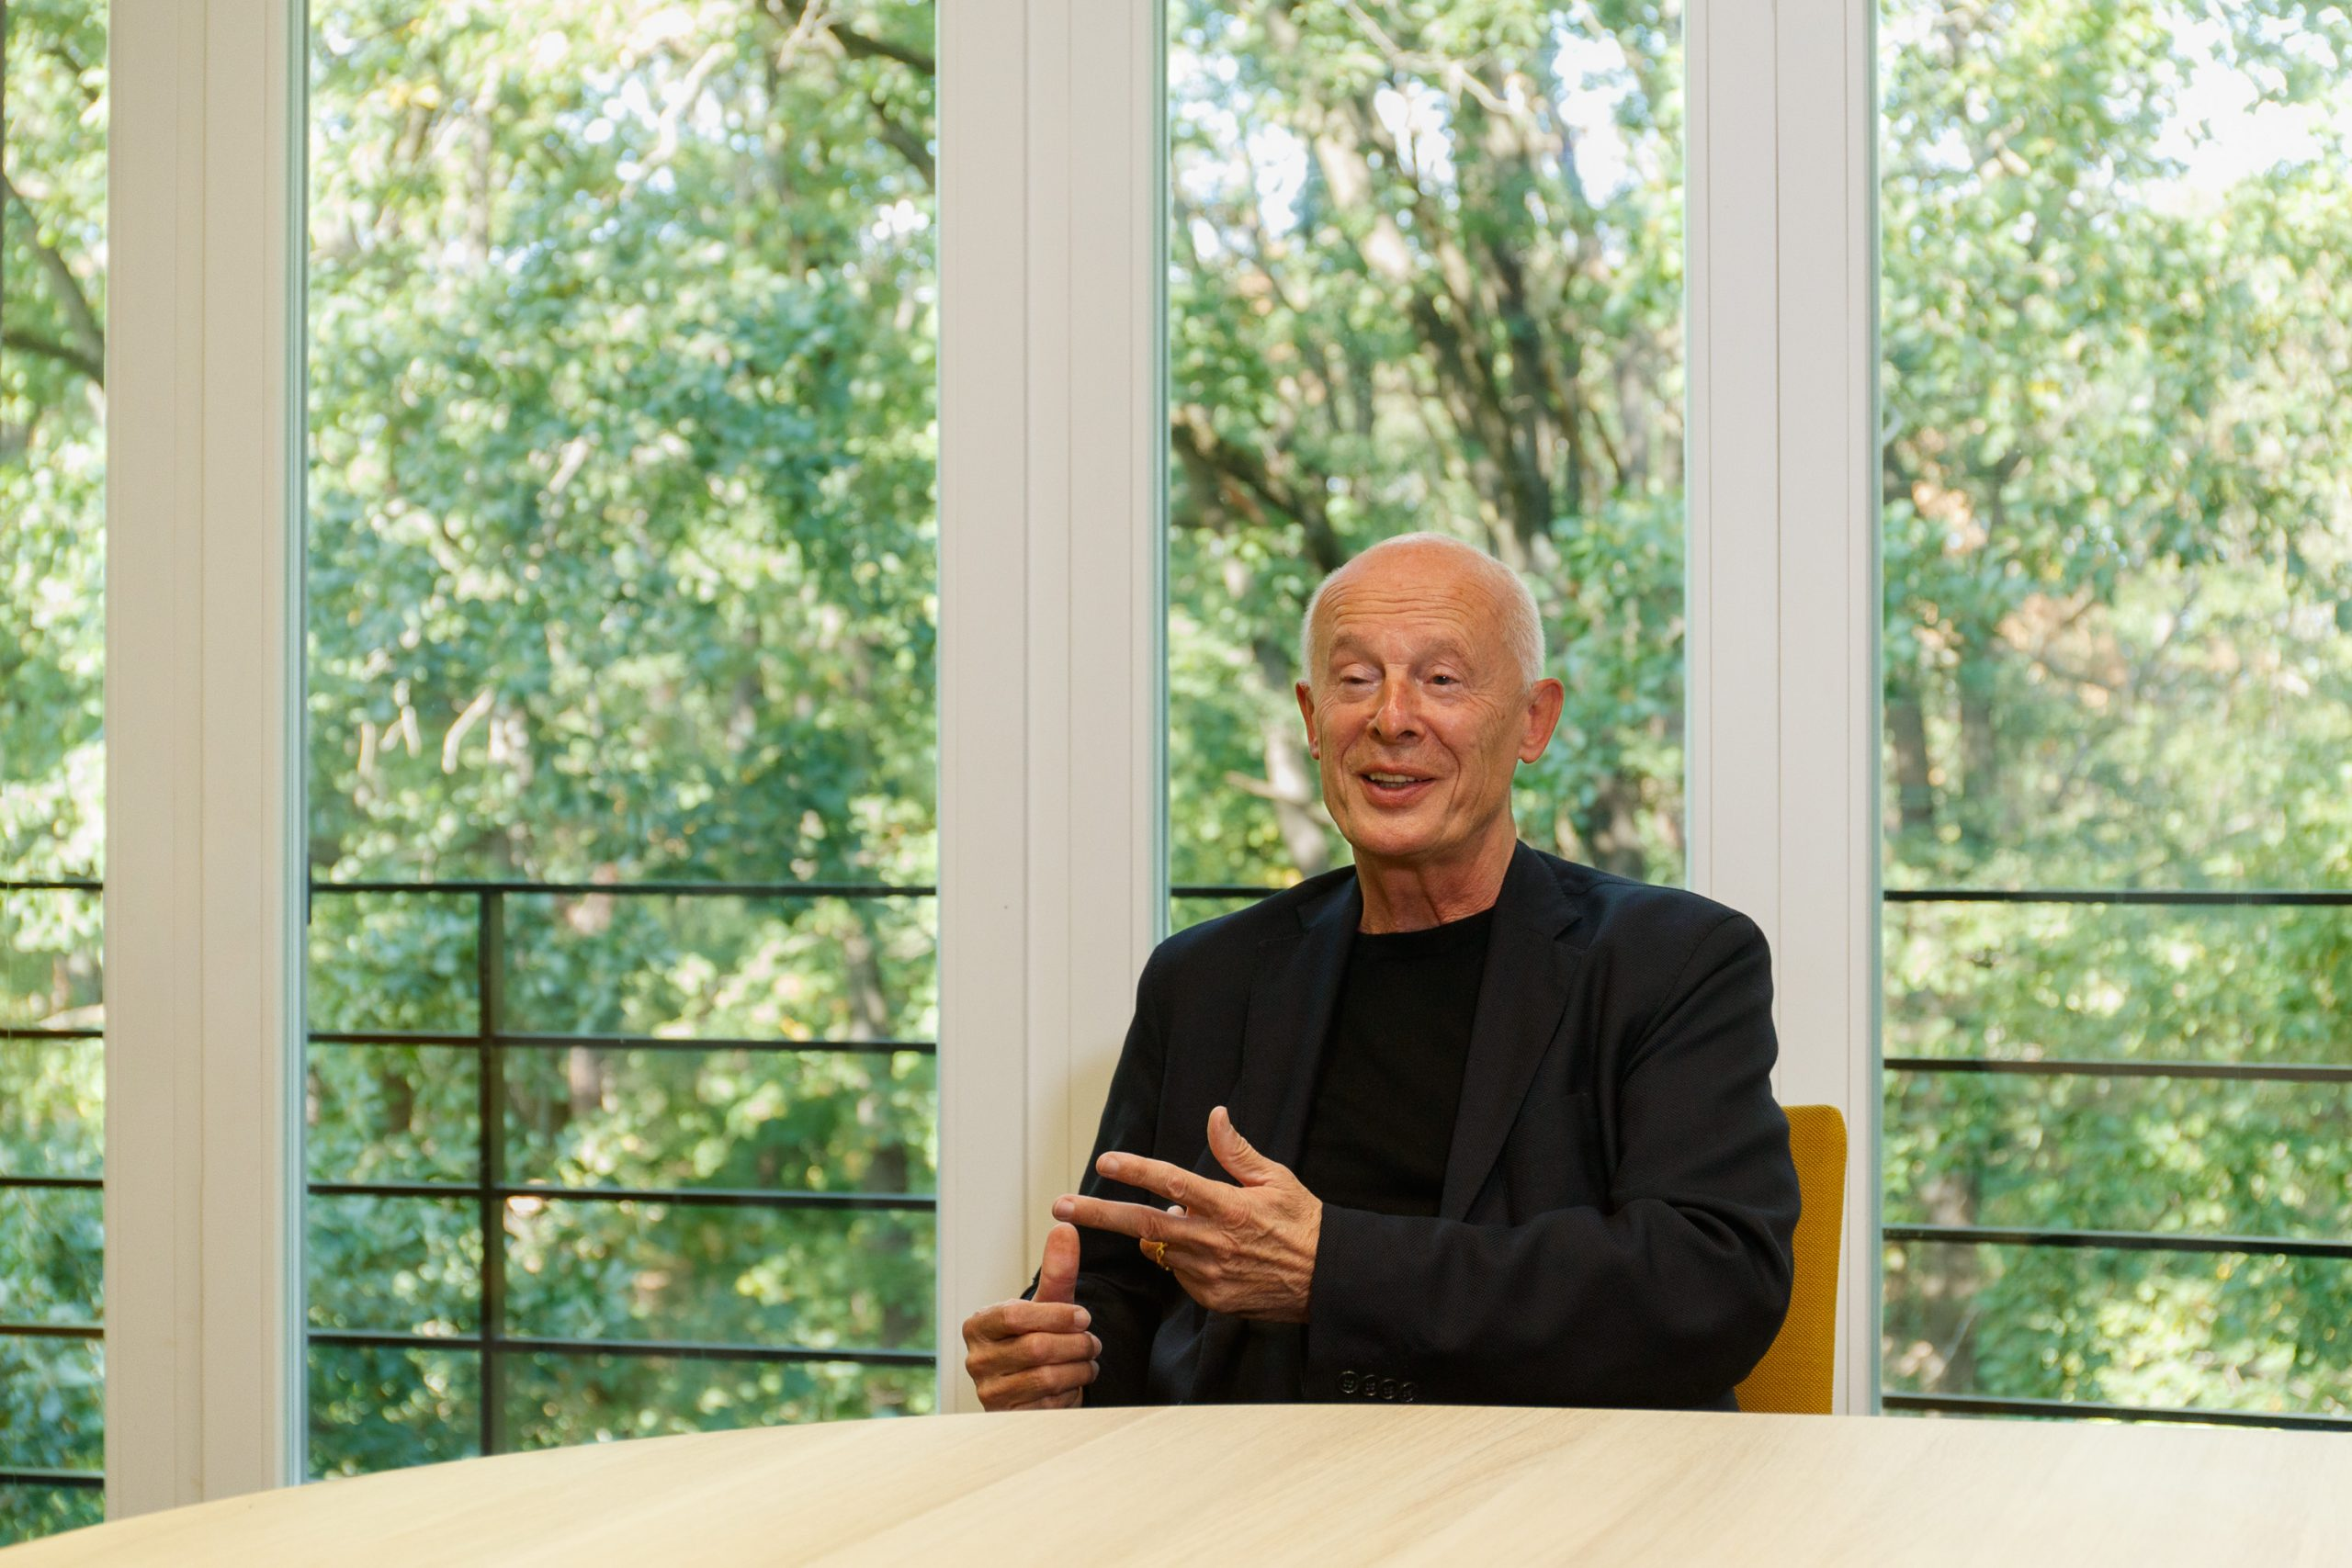 Home › PIK Members › Hans Joachim Schellnhuber › Portrait Gallery › Portrait Conversation I, Source: PIK/Karkow, 2020